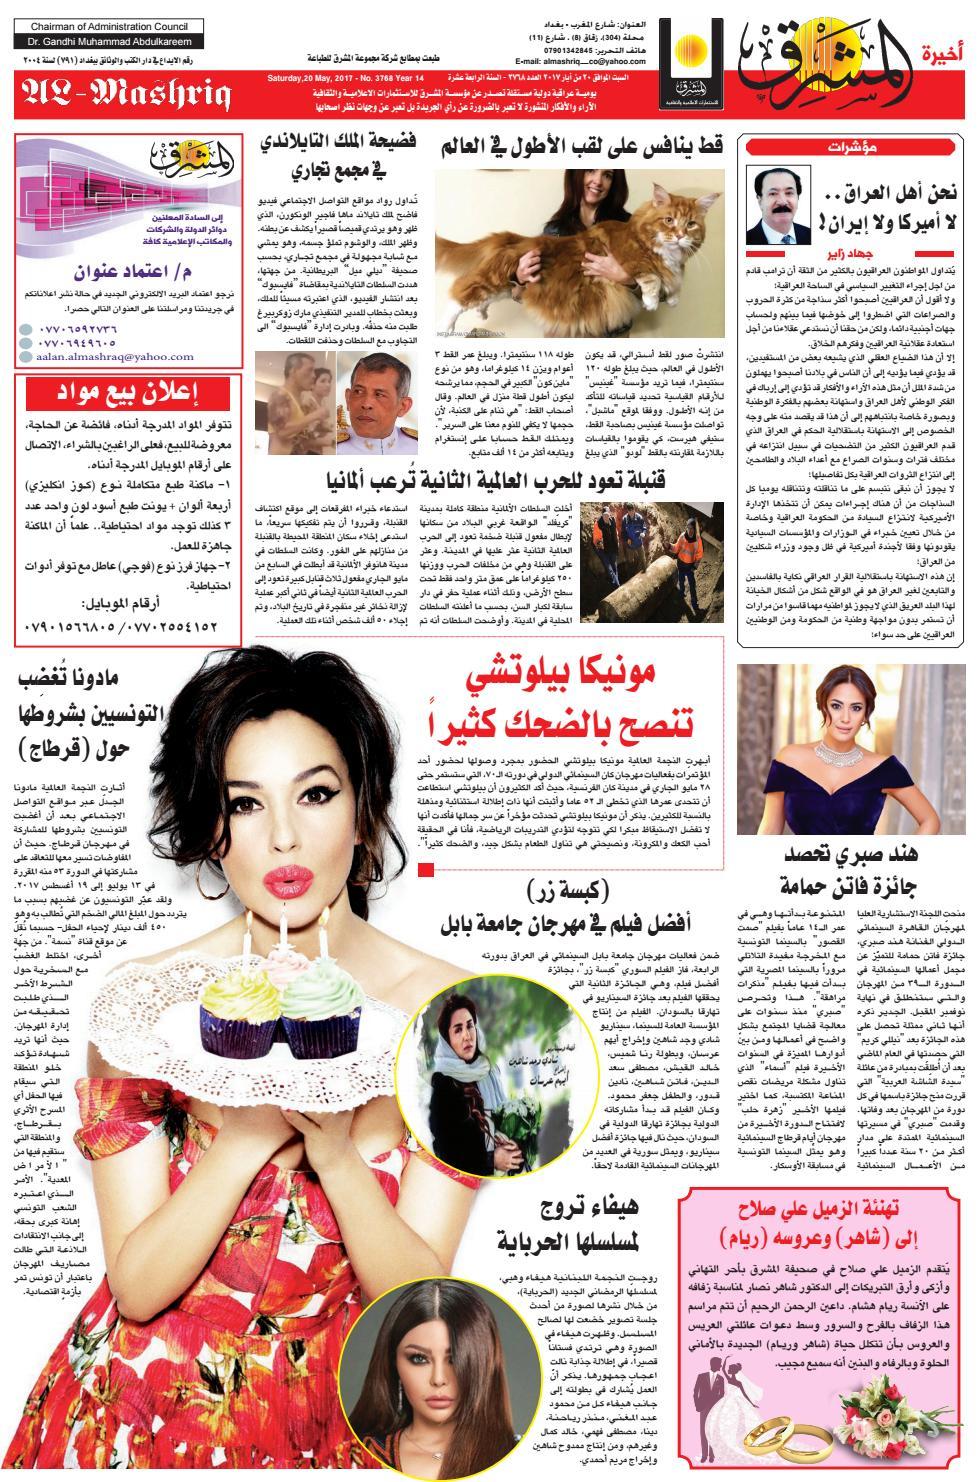 da6977114a89f 3768 AlmashriqNews by Al Mashriq Newspaper - issuu